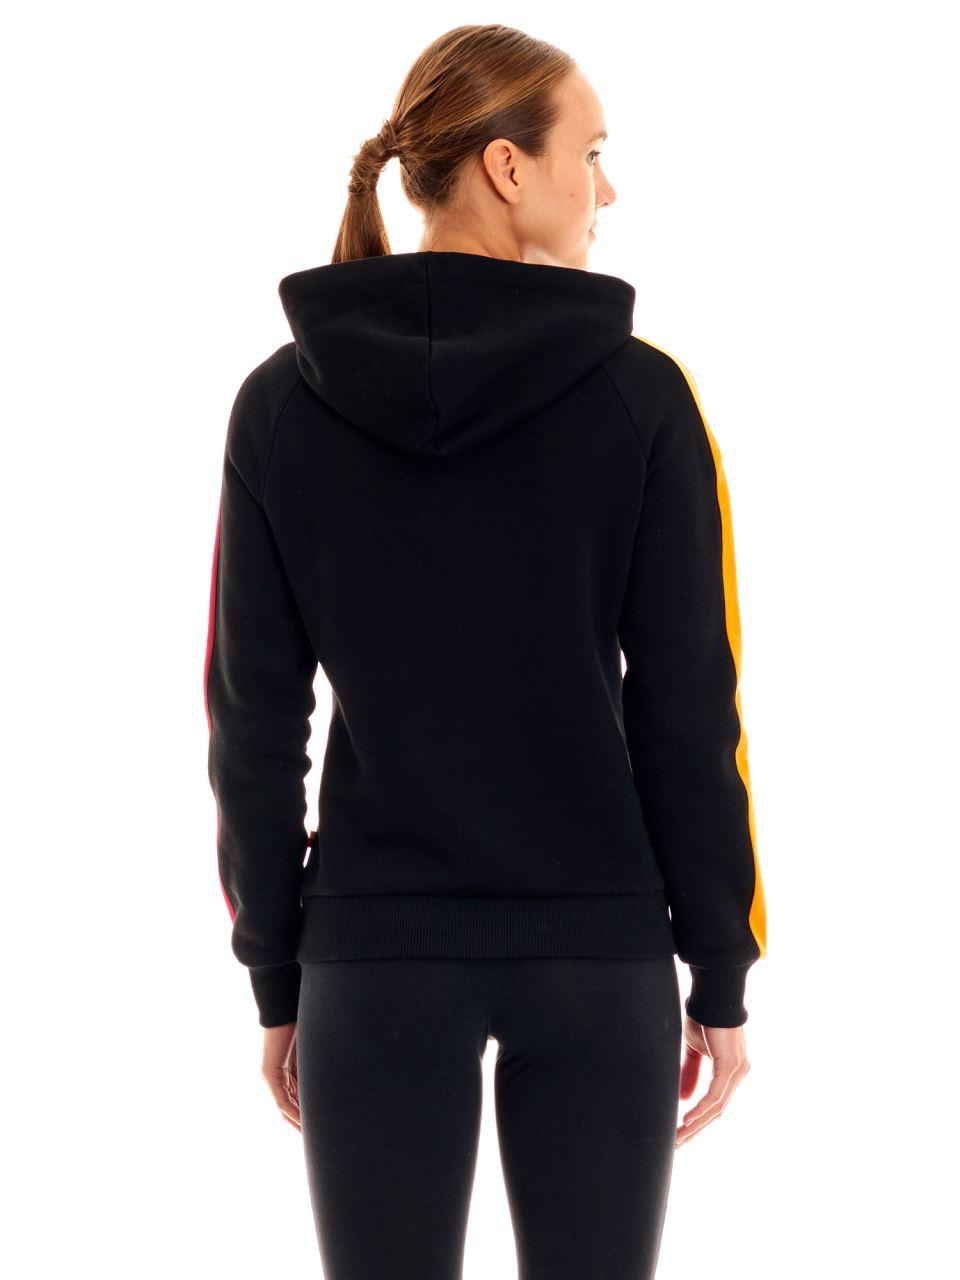 K192141 Sweatshirt